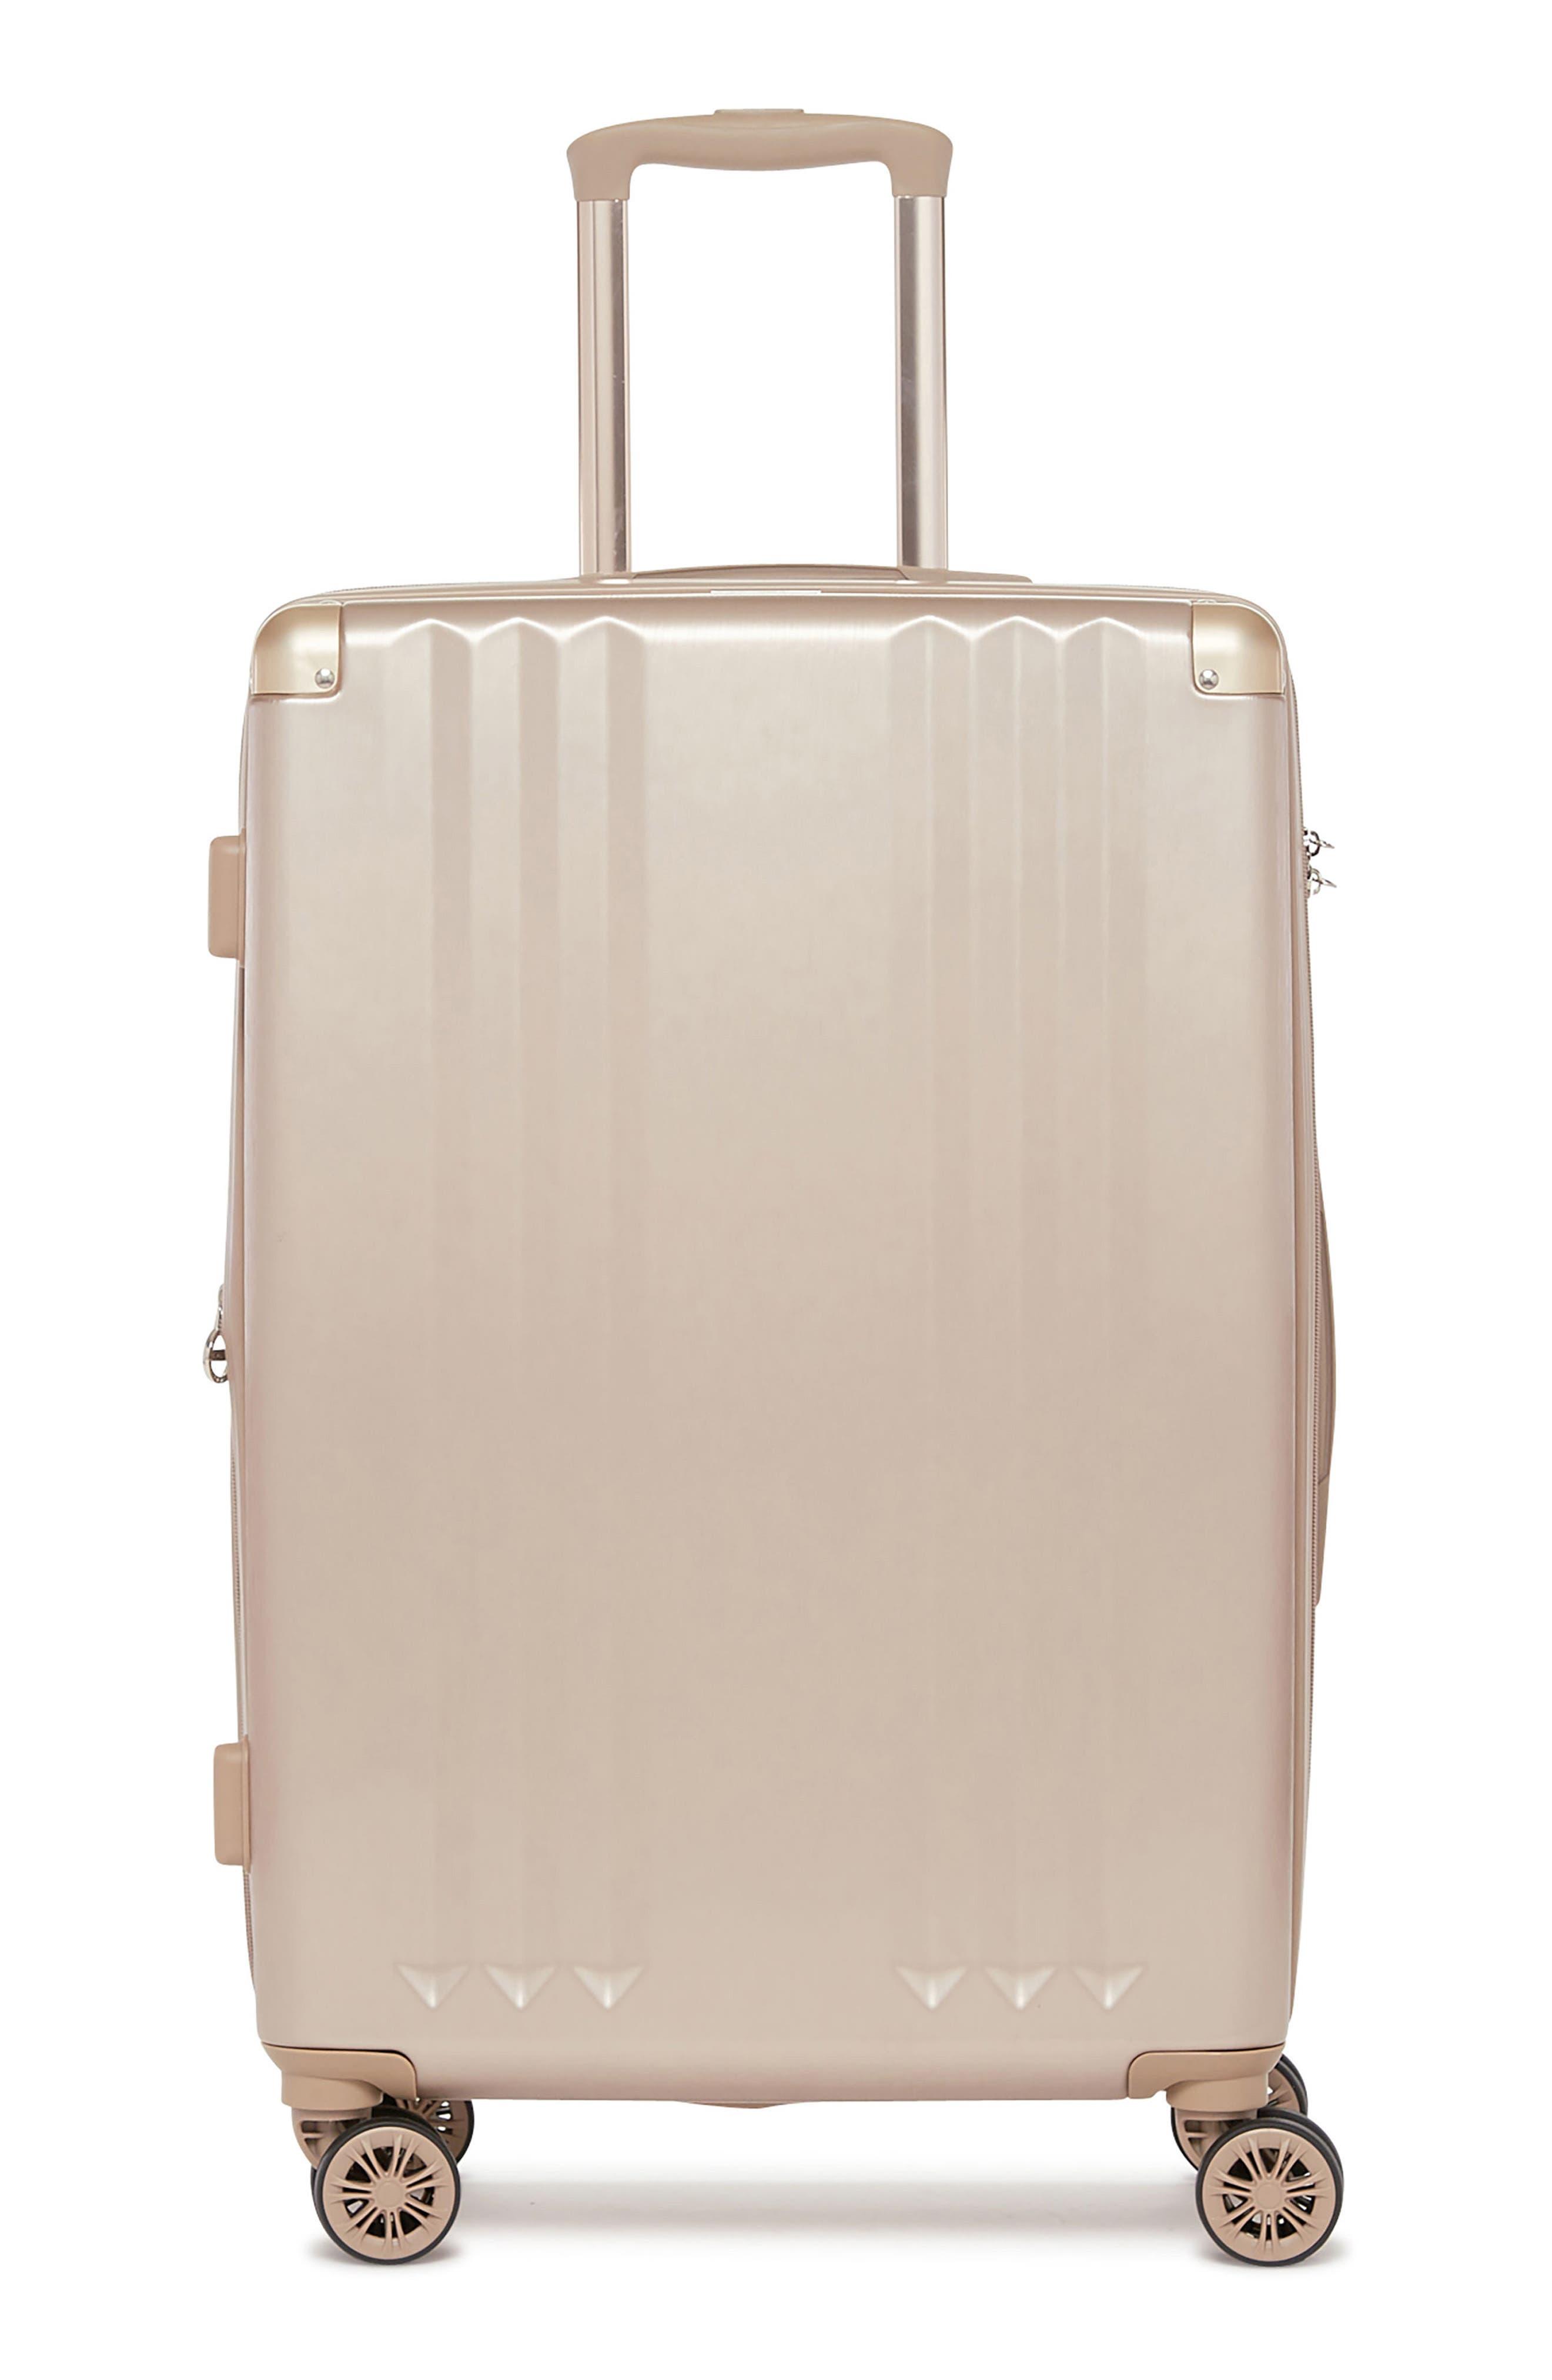 Ambeur 3-Piece Metallic Luggage Set,                             Main thumbnail 1, color,                             GOLD